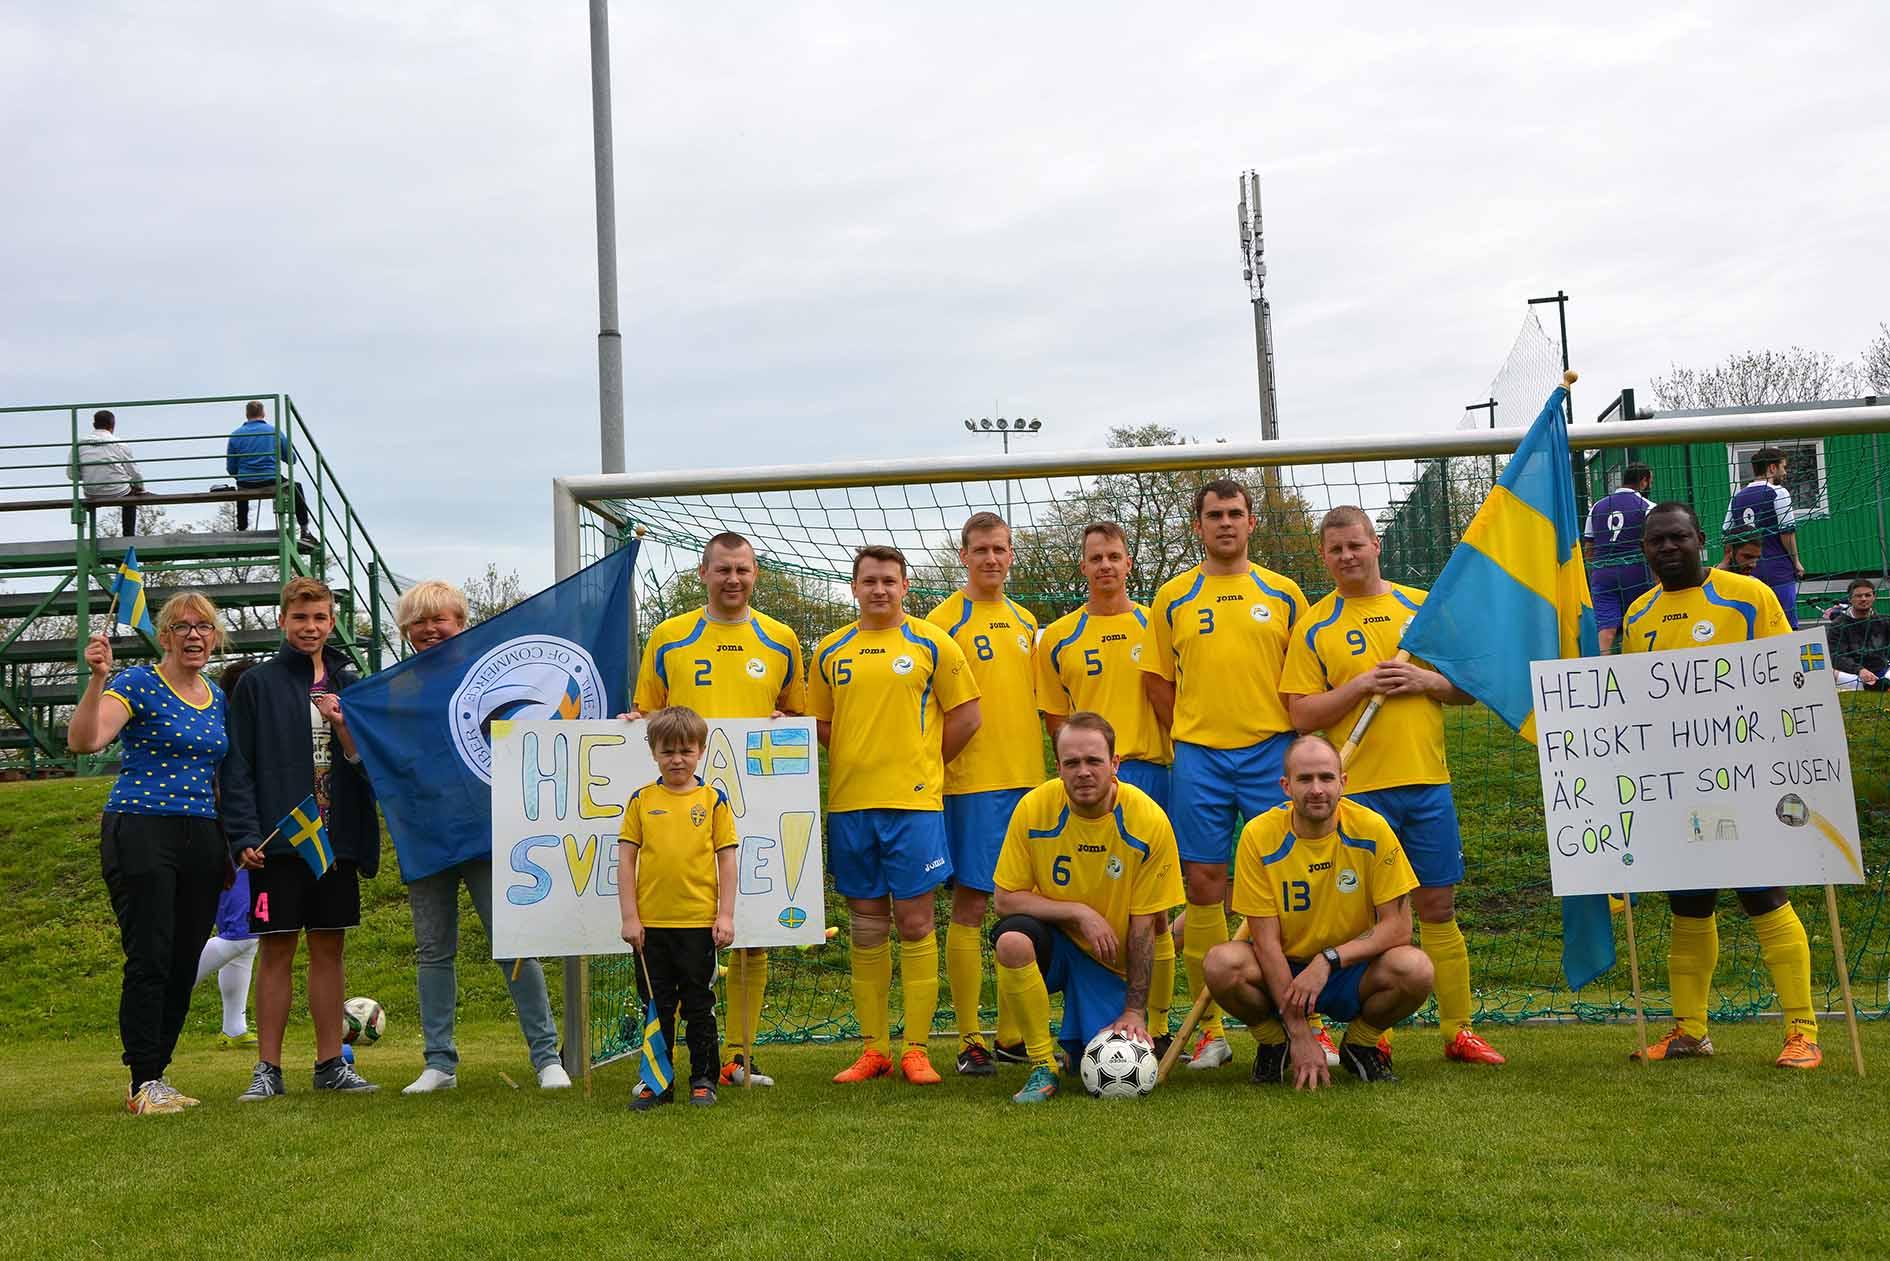 2017.05.27 Football tournament (1)